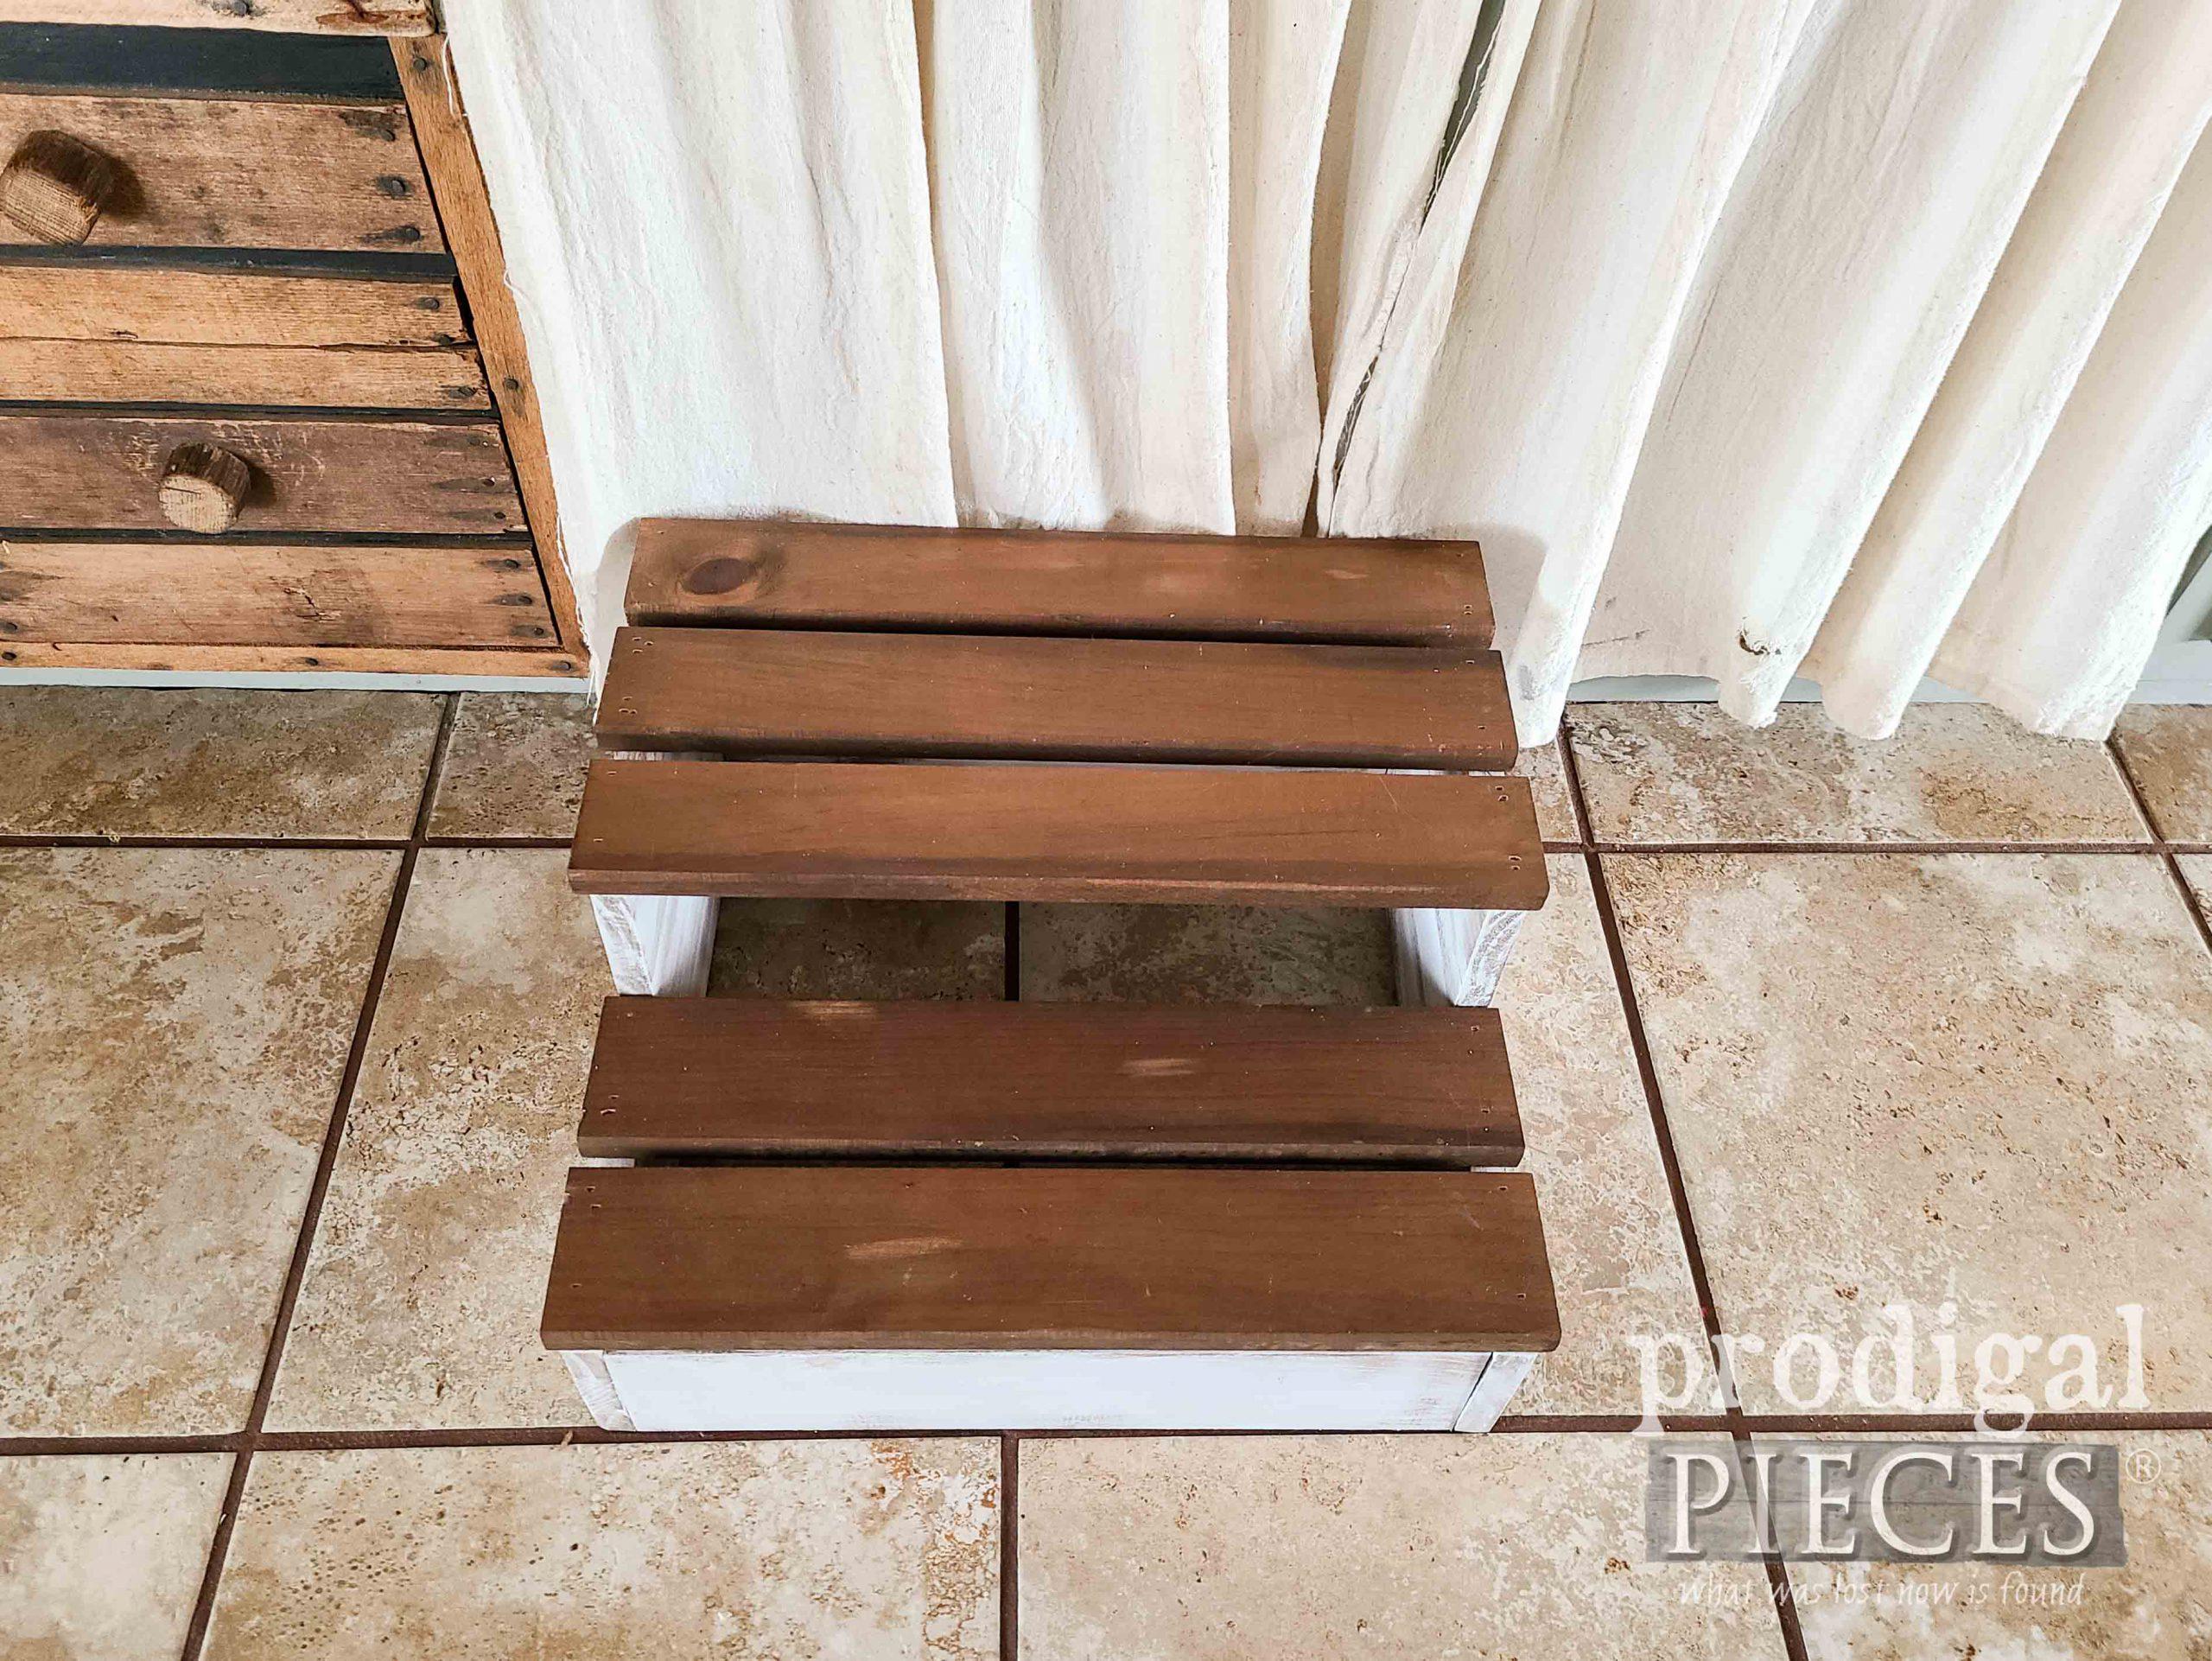 DIY Wood Slat Step Stool for Home by Larissa of Prodigal Pieces | prodigalpieces.com #prodigalpieces #farmhouse #home #diy #homedecor